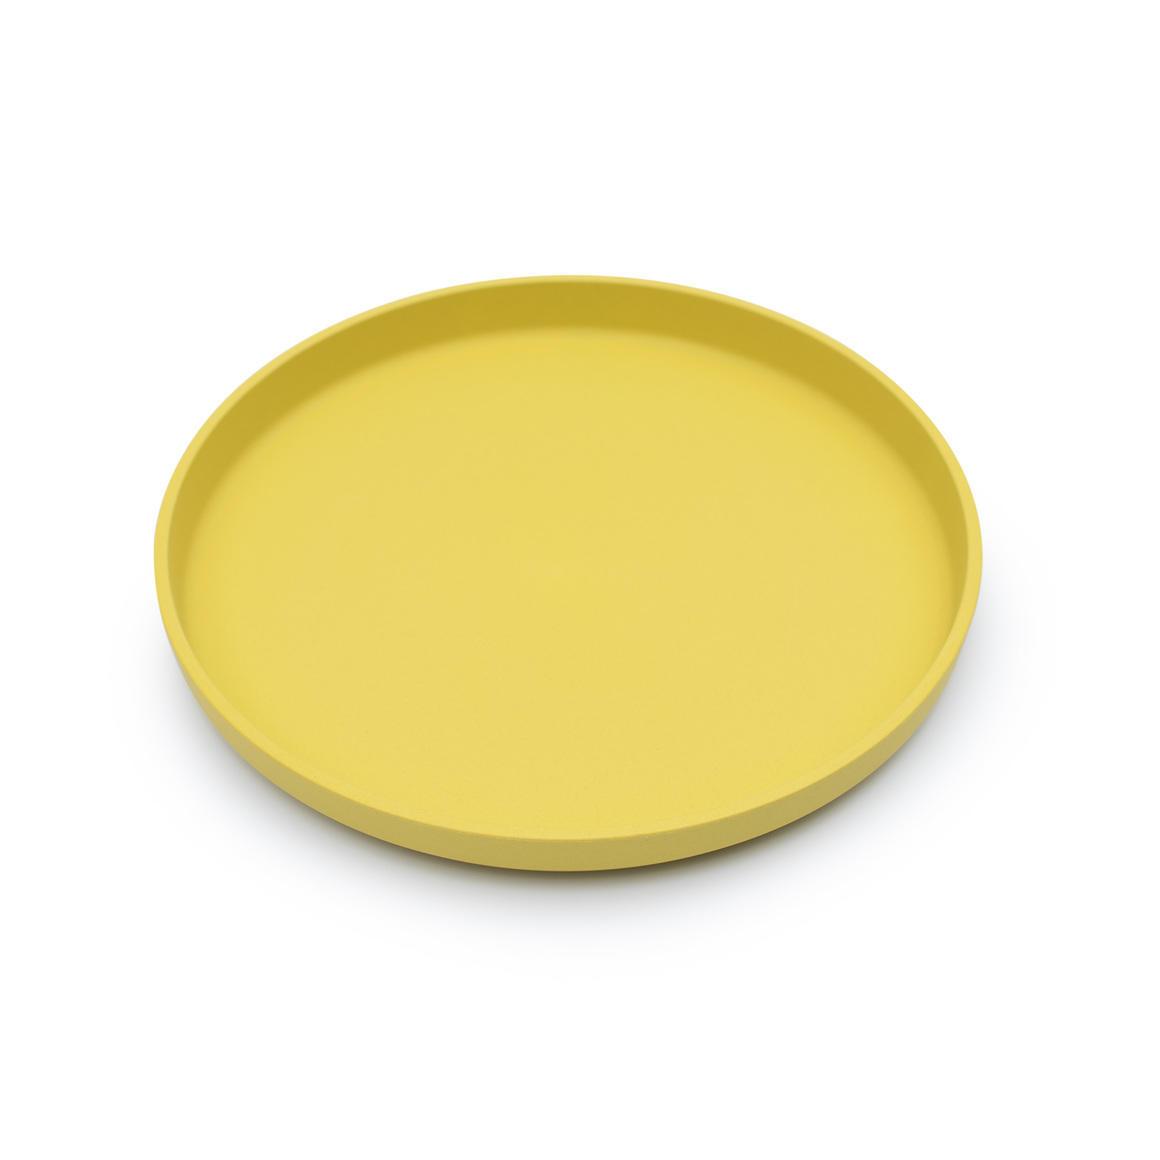 Plant-Based Plate - Yellow   Trada Marketplace